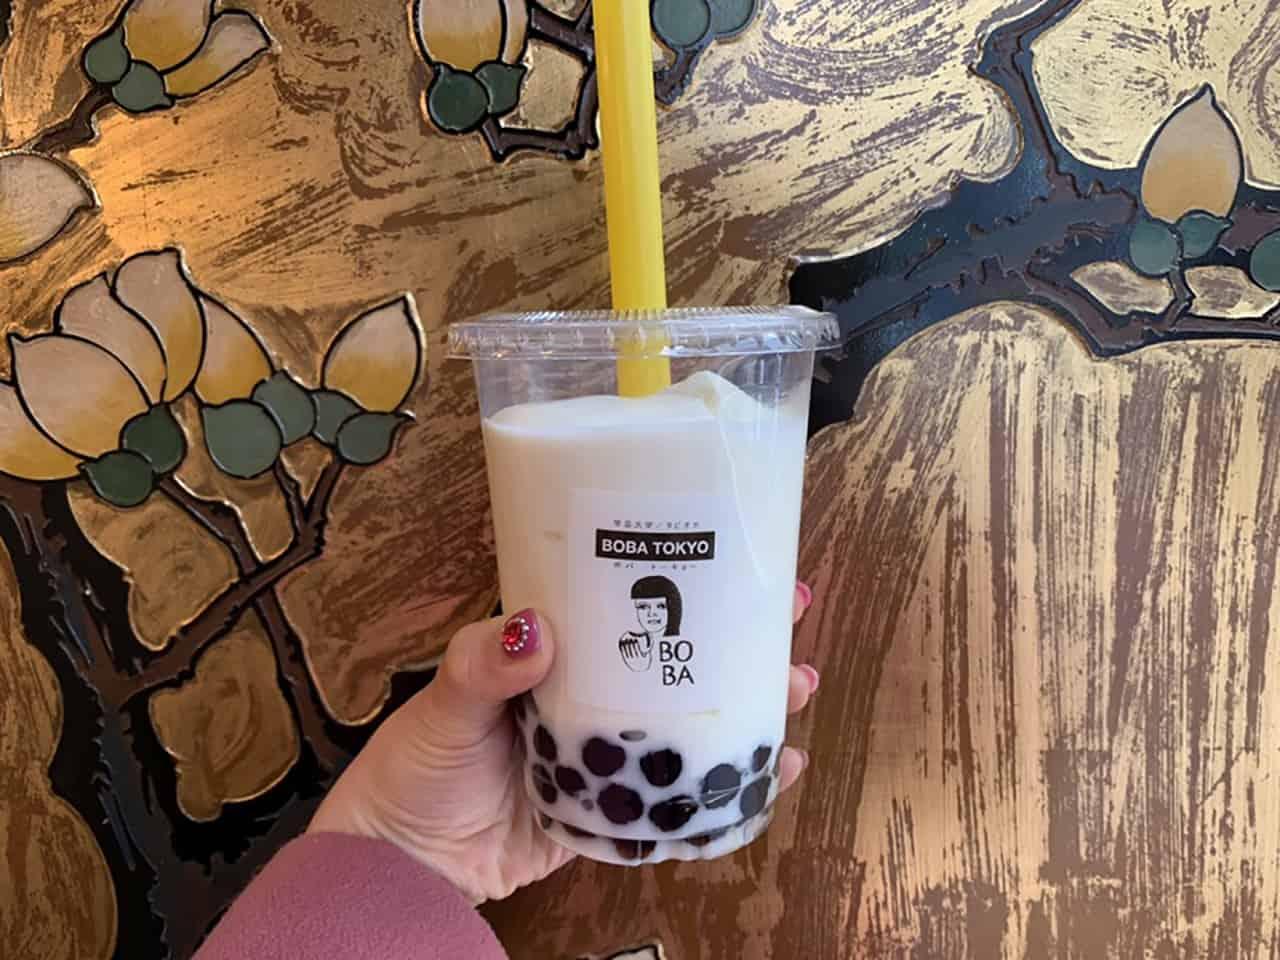 Boba tokyo, Tokyo, Milk Tea, ชานมไข่มุก